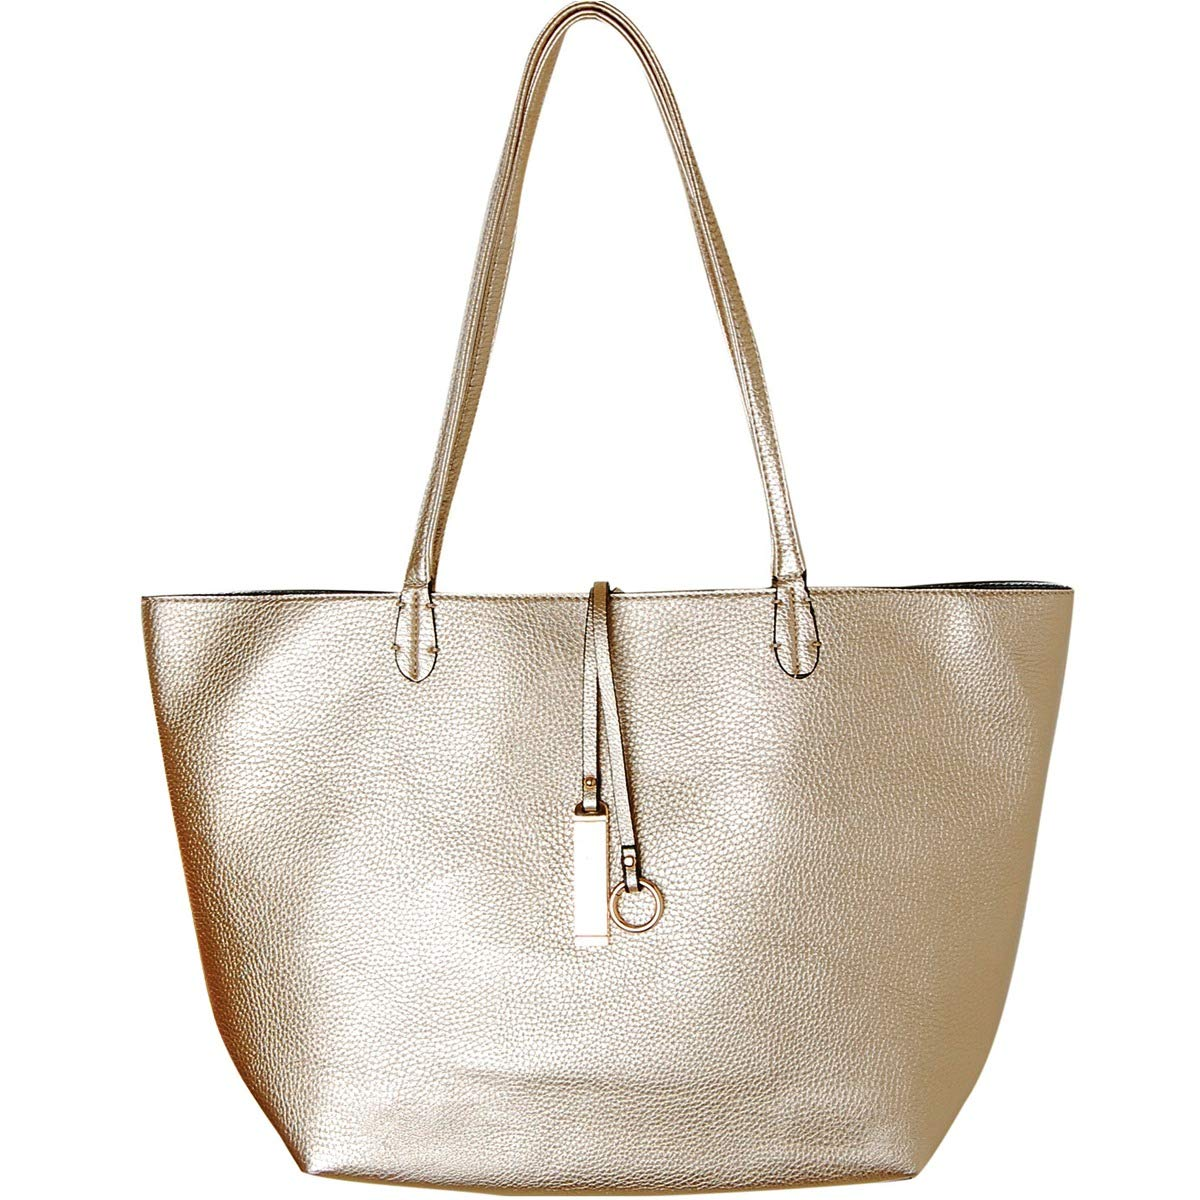 fe470126eaa8 Amazon.com  Humble Chic Reversible Vegan Leather Tote Bag - Oversized Top  Handle Large Shoulder Handbag Purse